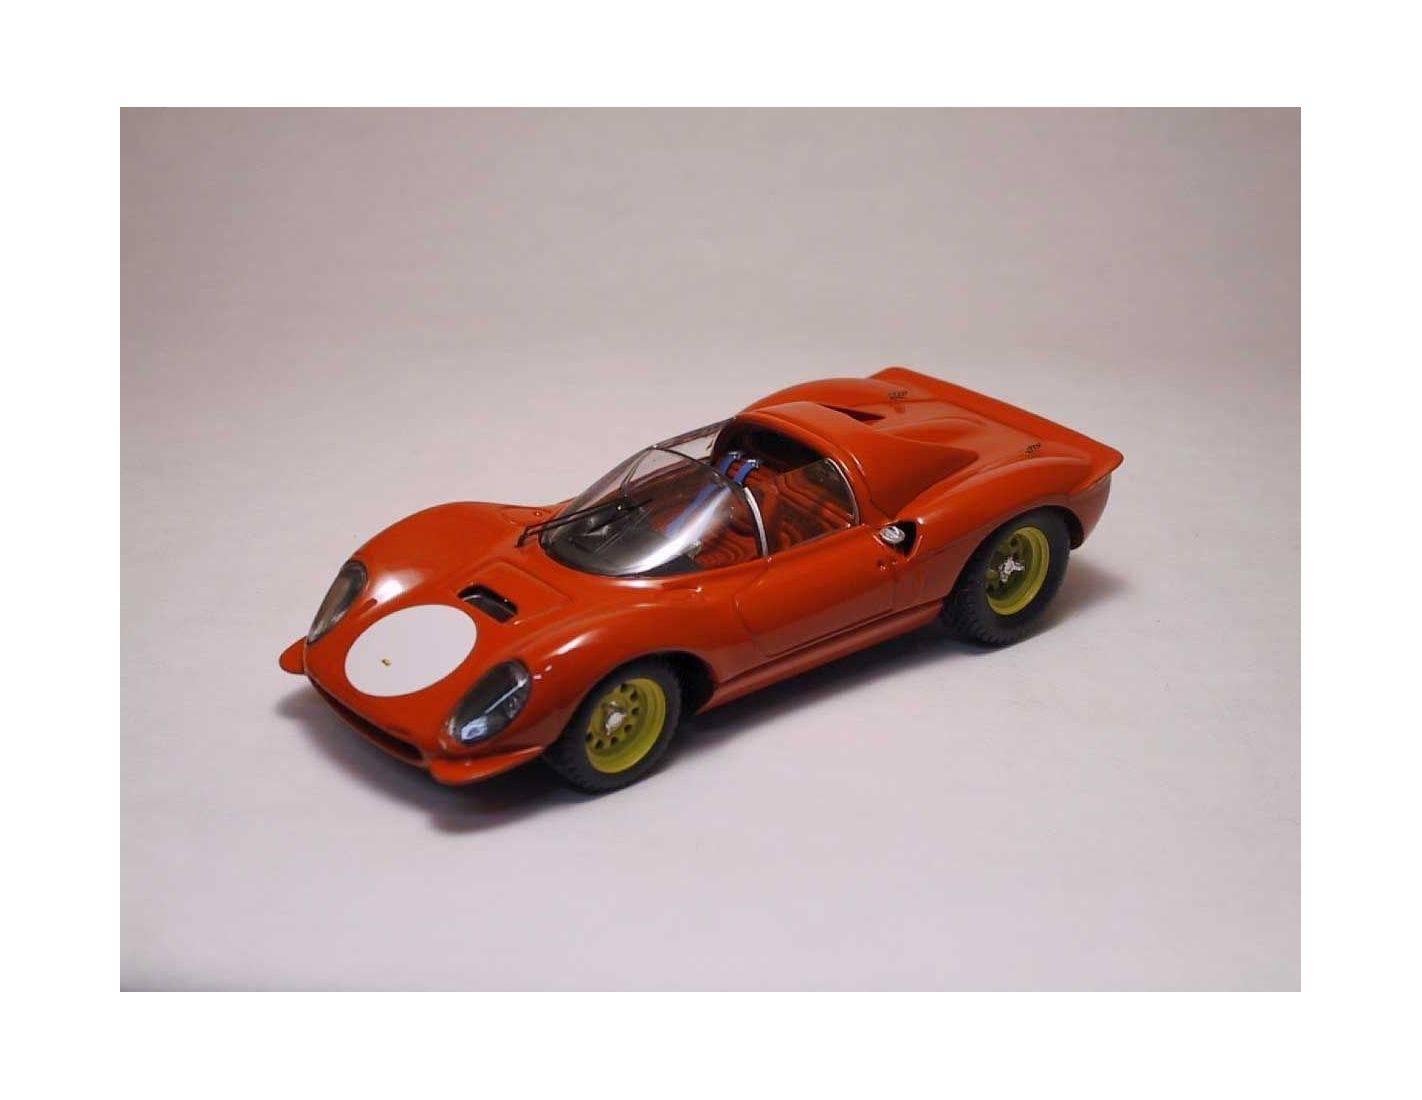 Art Model AM0029 FERRARI DINO 206 S 1966 RED 1:43 Modellino